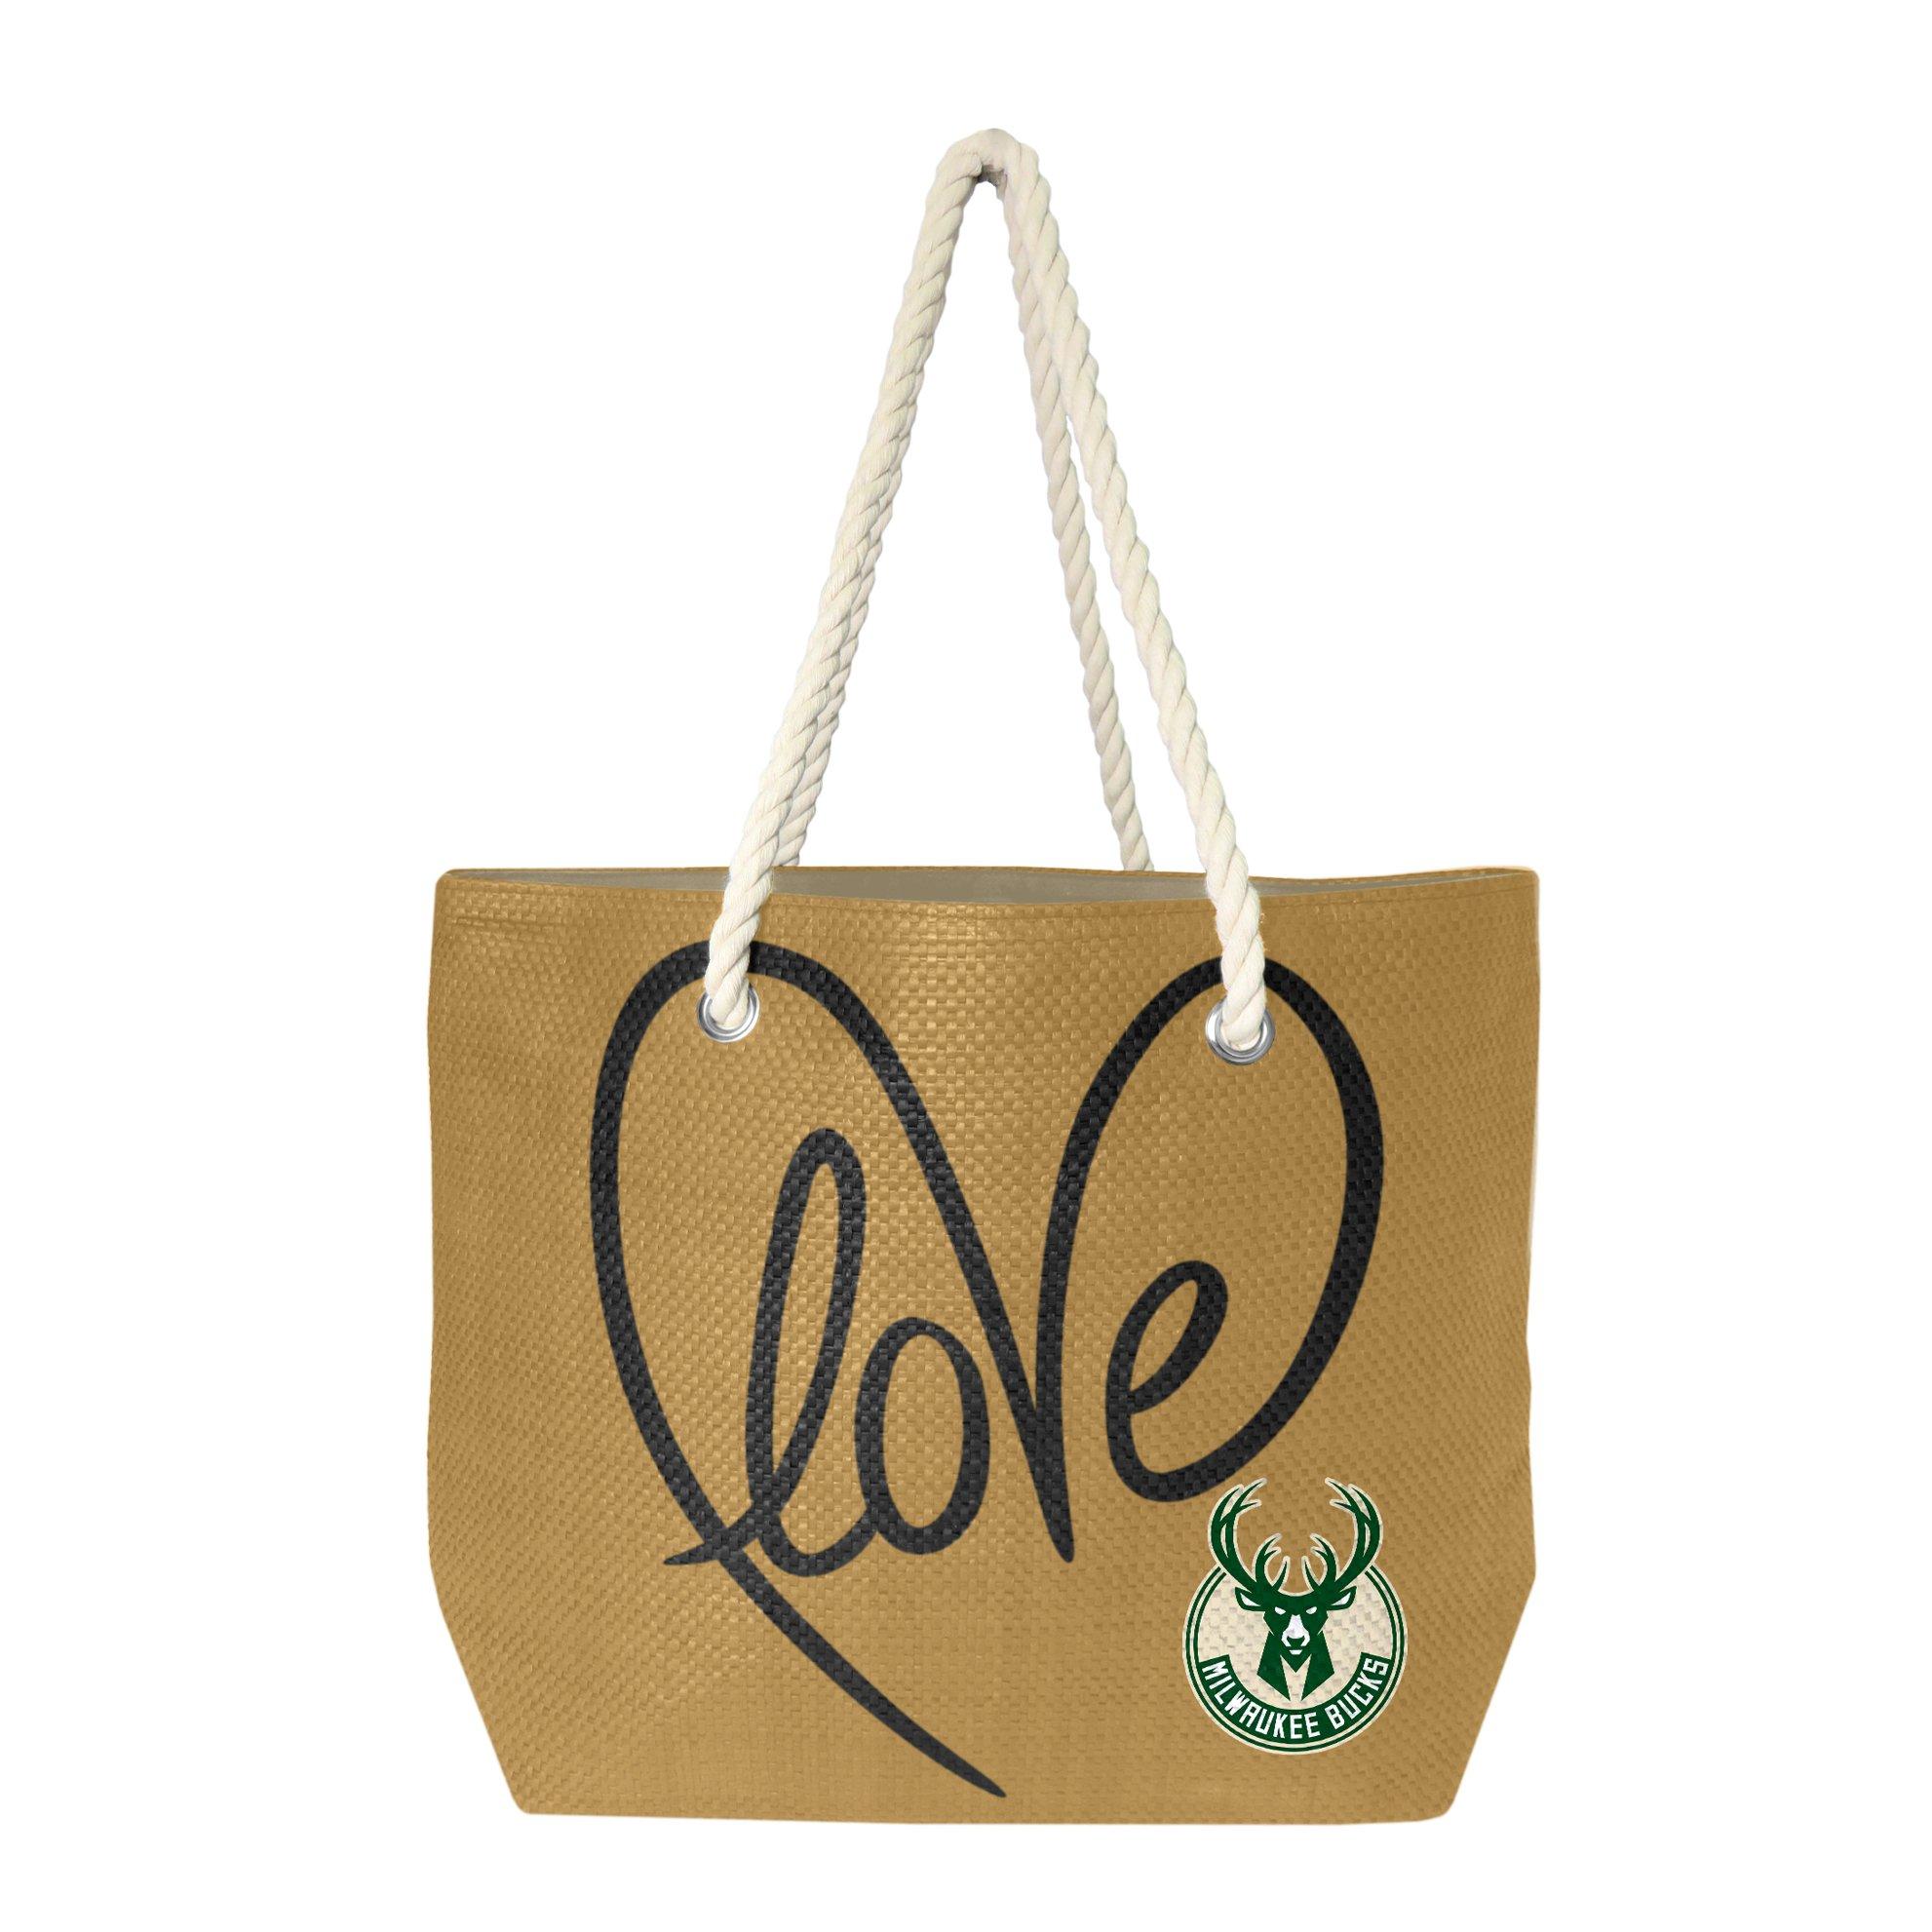 NBA Milwaukee Bucks Rope Tote Bag by Littlearth